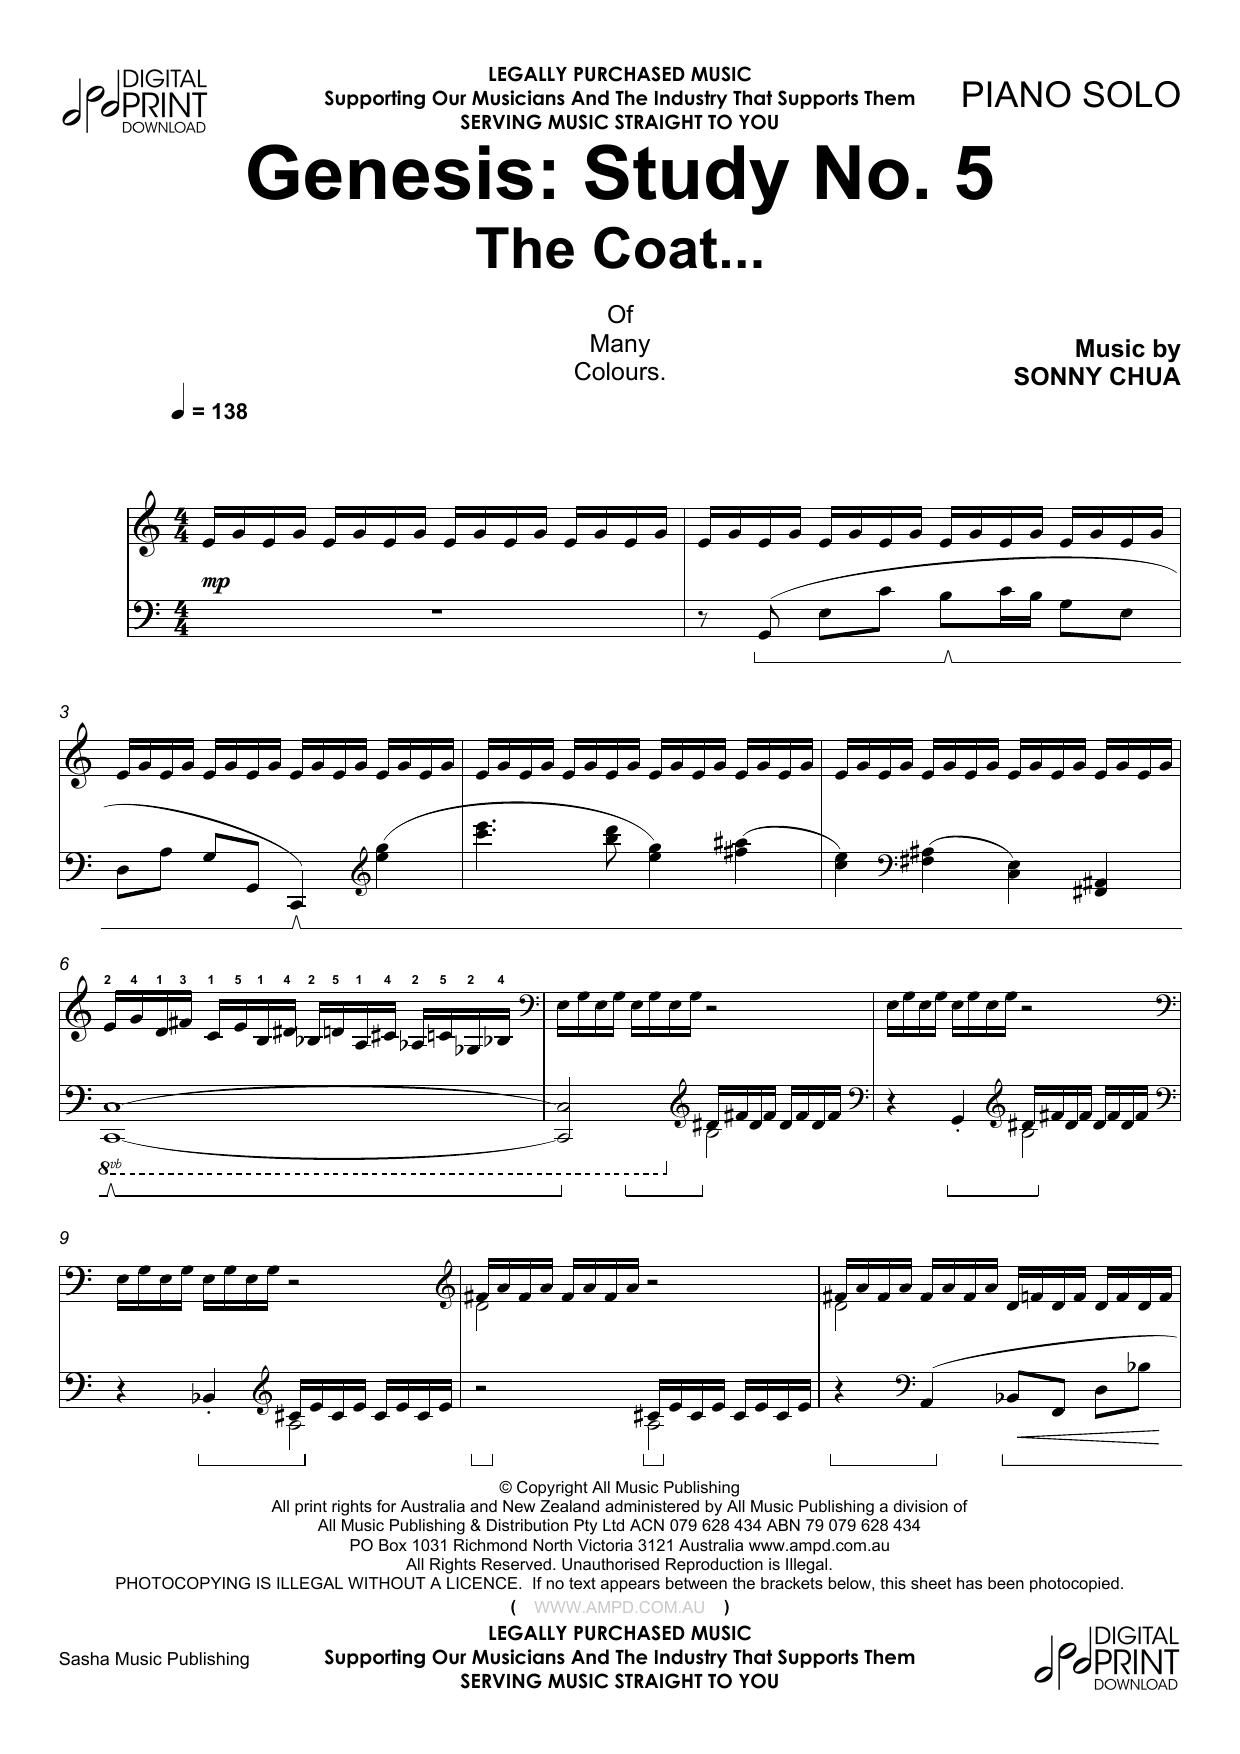 Genesis Study No 5 The Coat (Piano Solo)